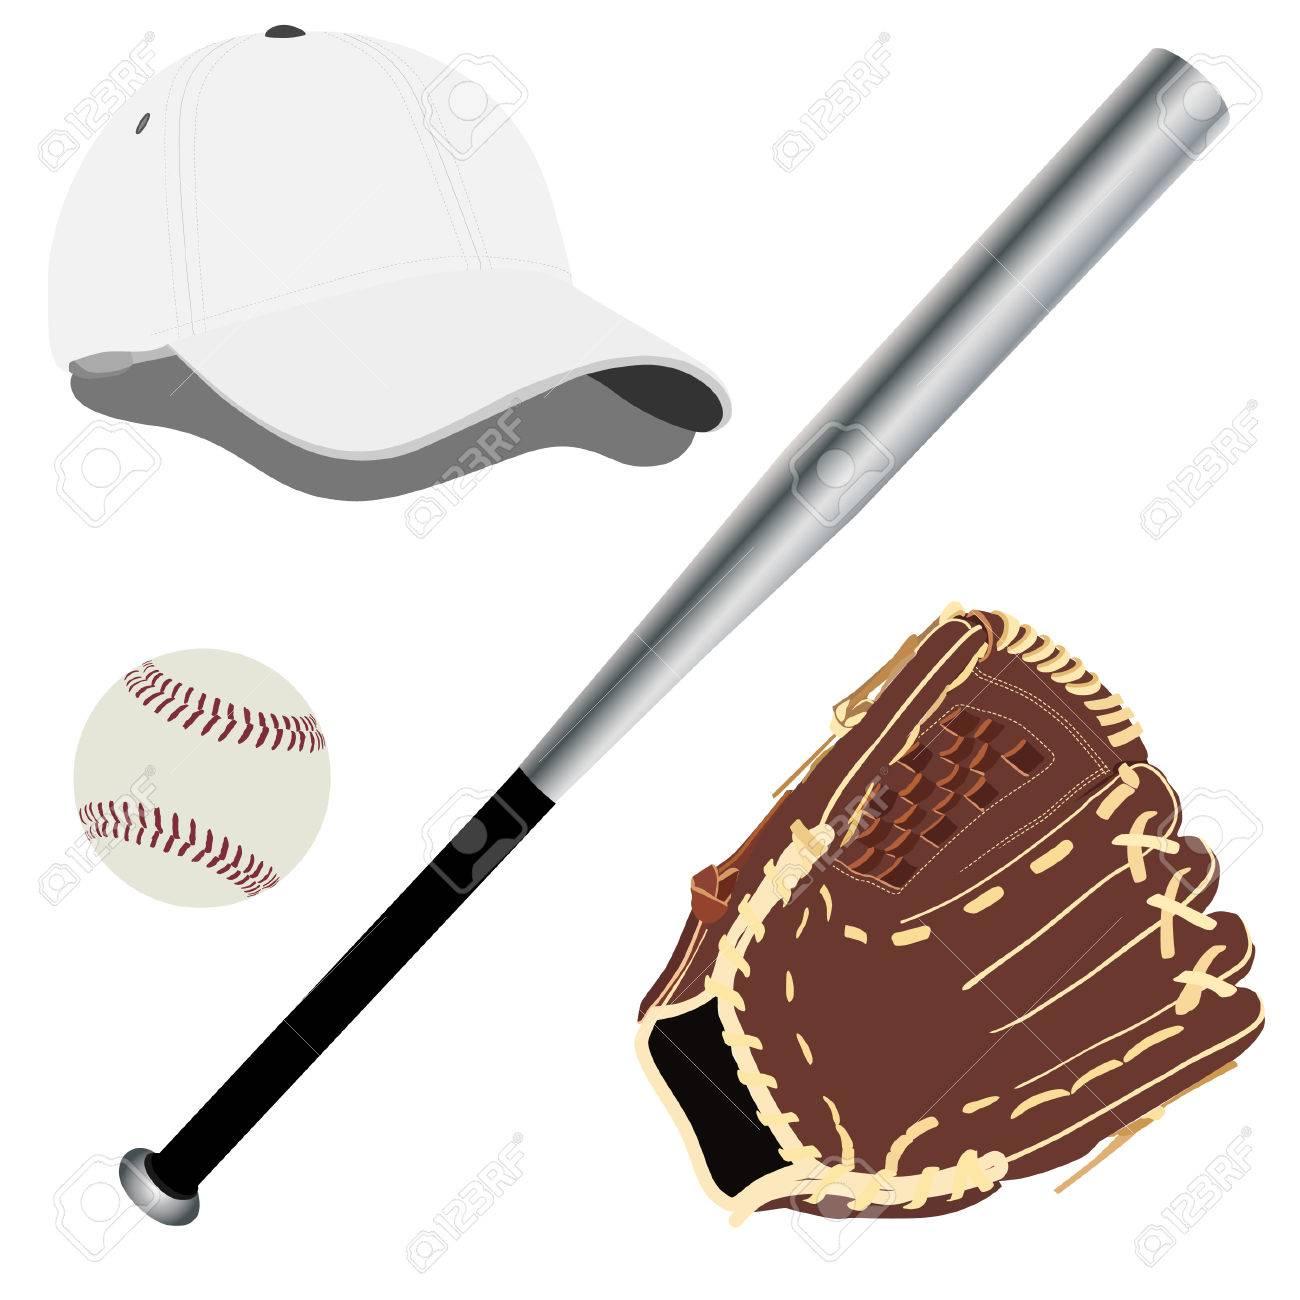 baseball cap baseball hat baseball bat baseball glove royalty rh 123rf com Baseball Bat and Ball Clip Art Baseball Bat Clip Art Vector